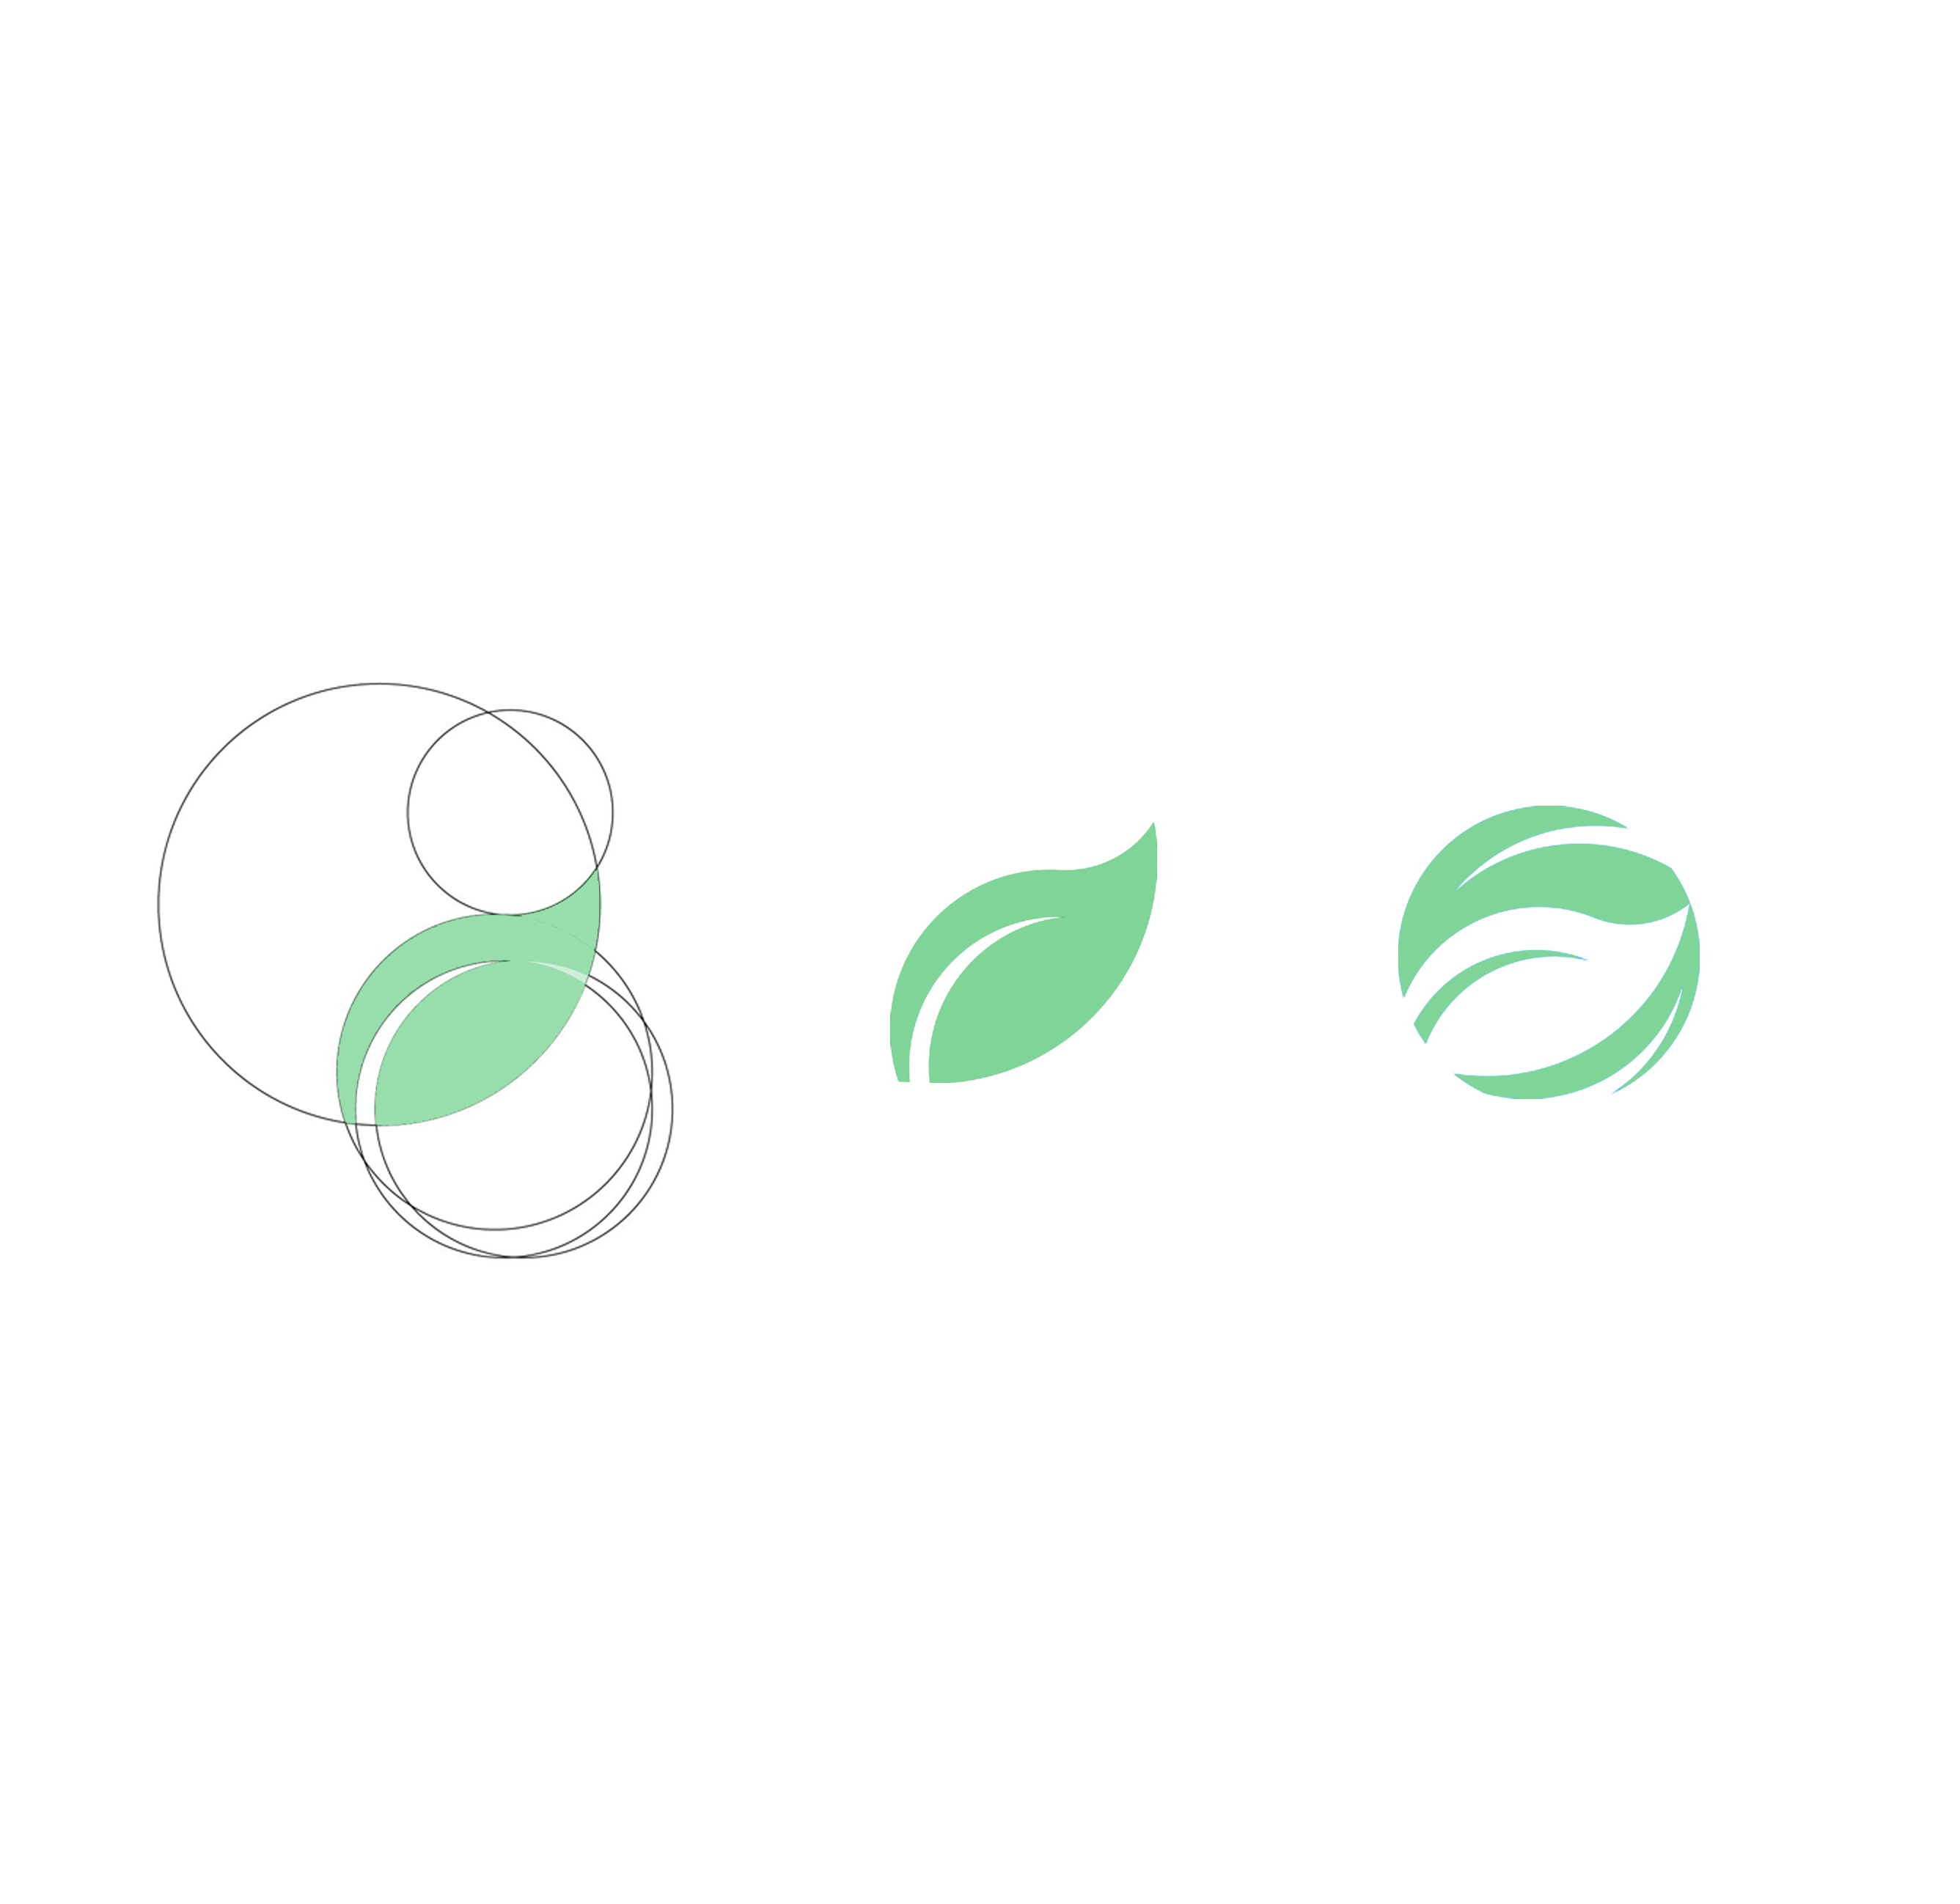 Разработка логотипа торговой марки фото f_830596bbfb74b7a5.jpg